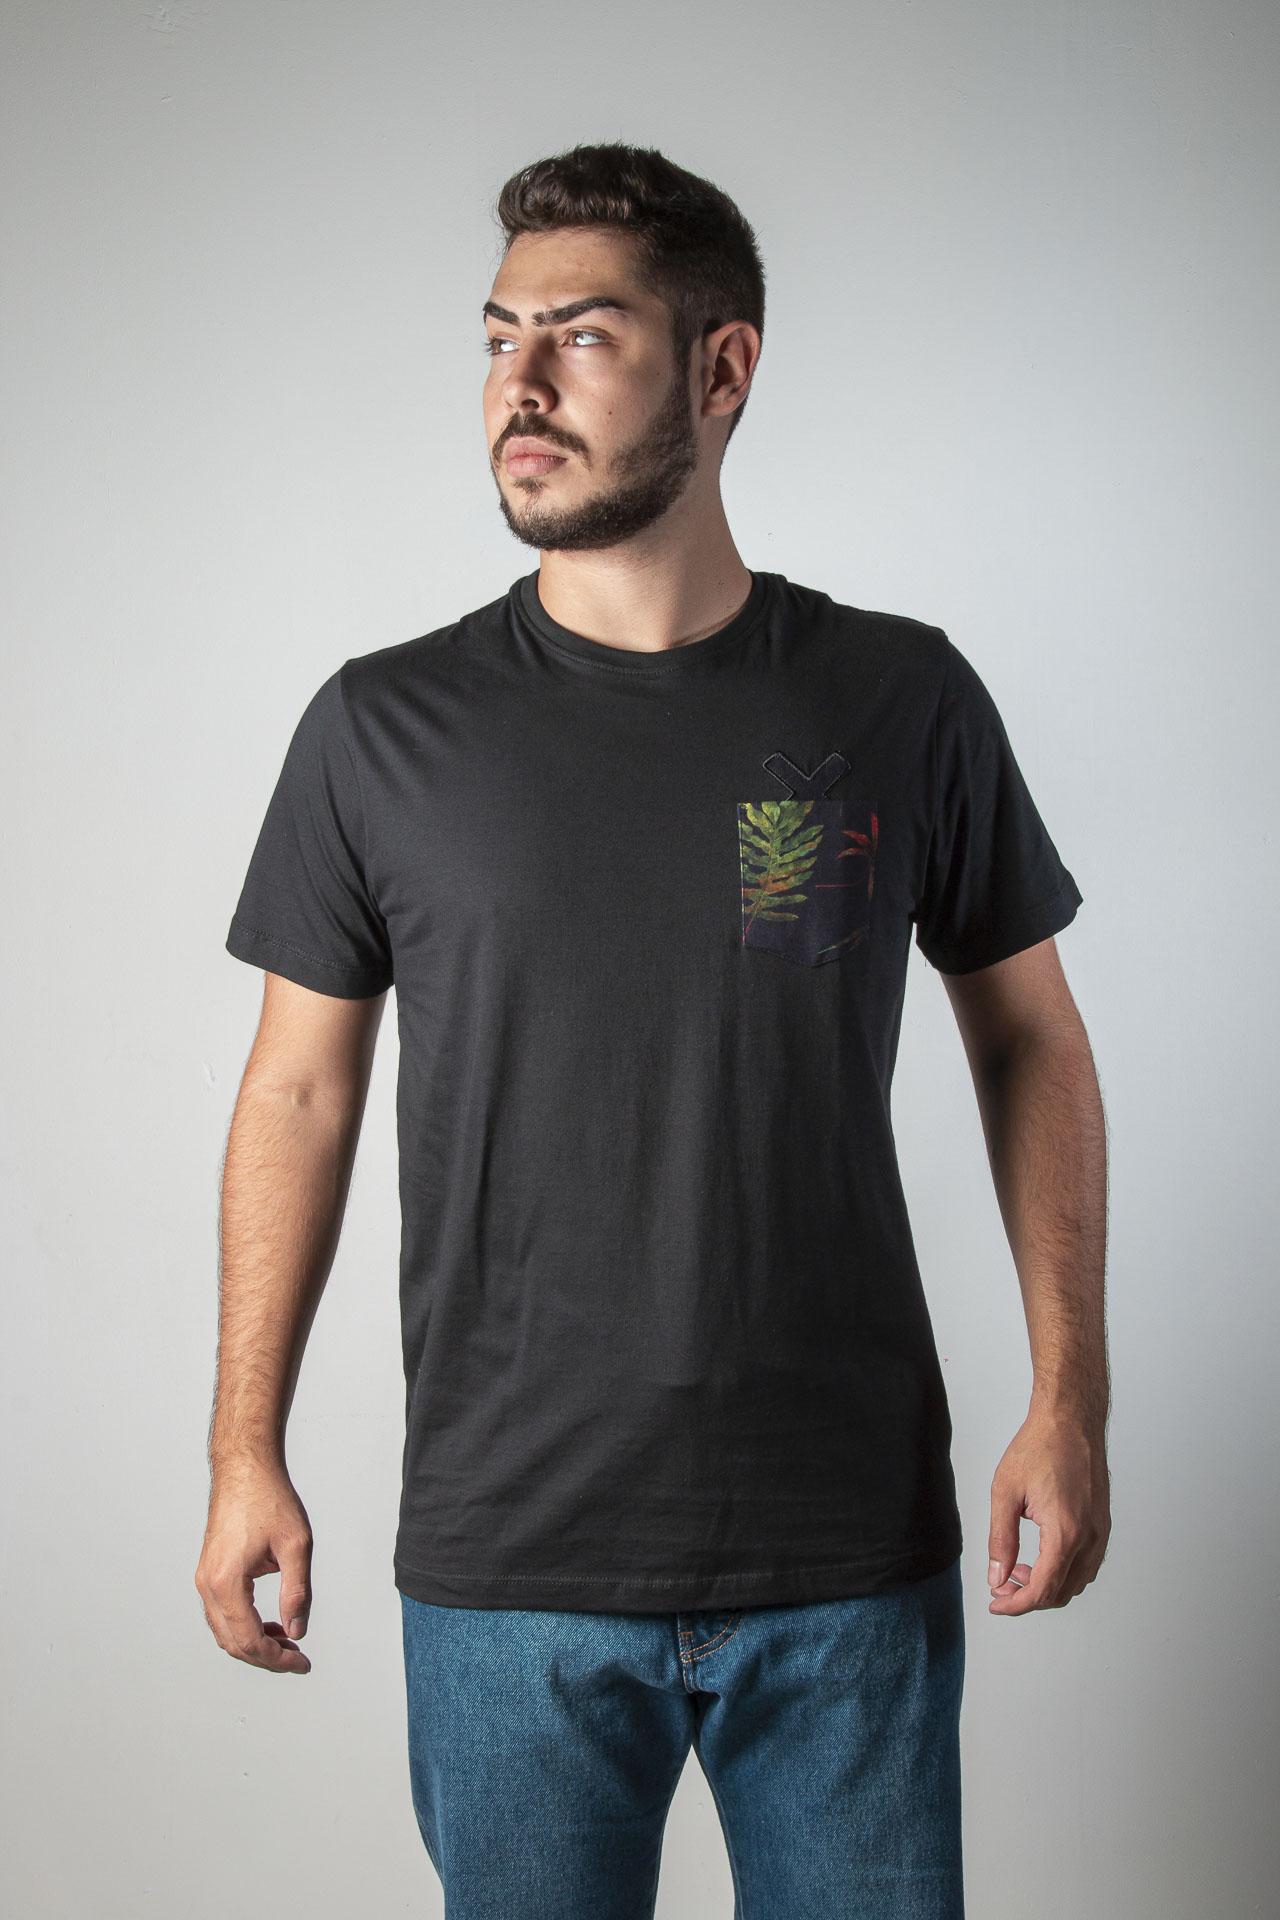 Camiseta Masculina TXC 1996